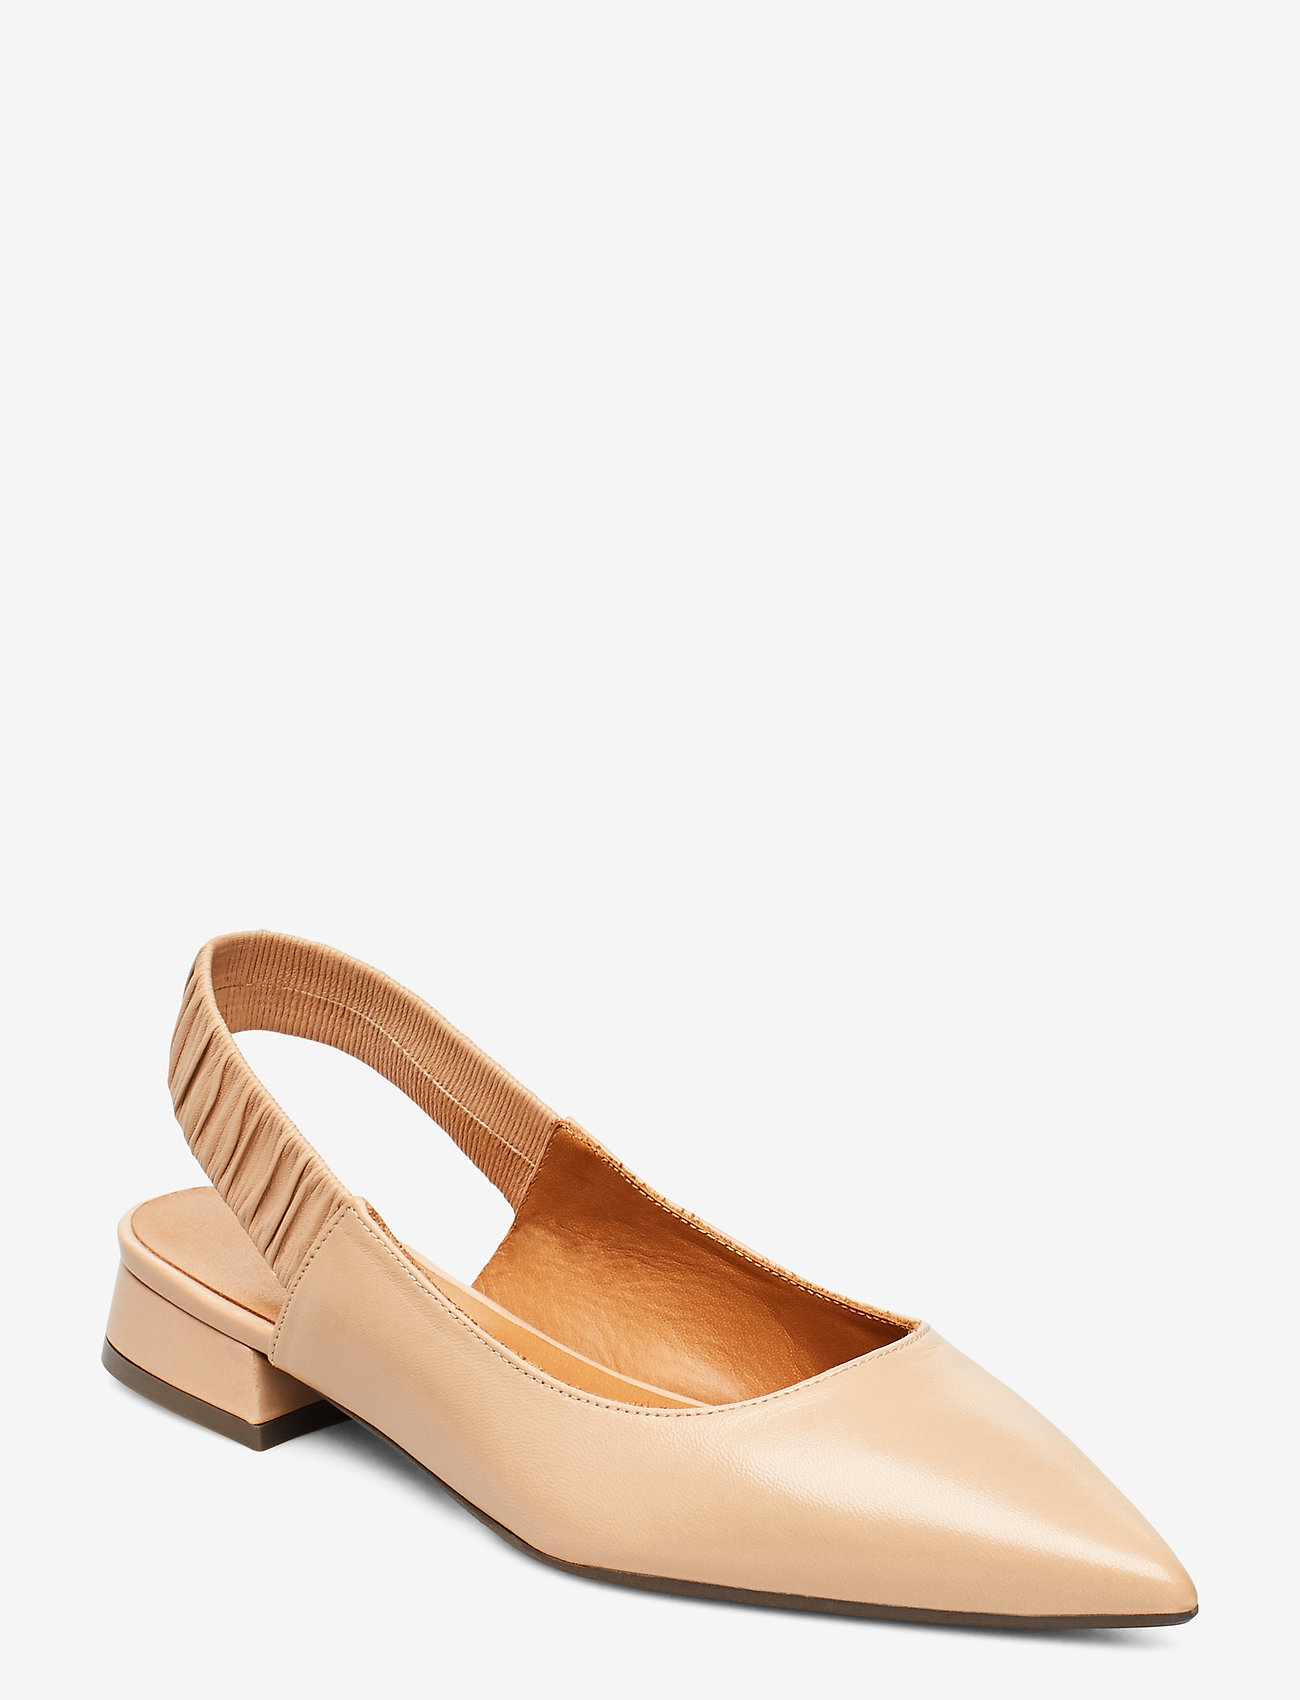 Billi Bi - Shoes 4512 - sling backs - beige 5845 nappa 72